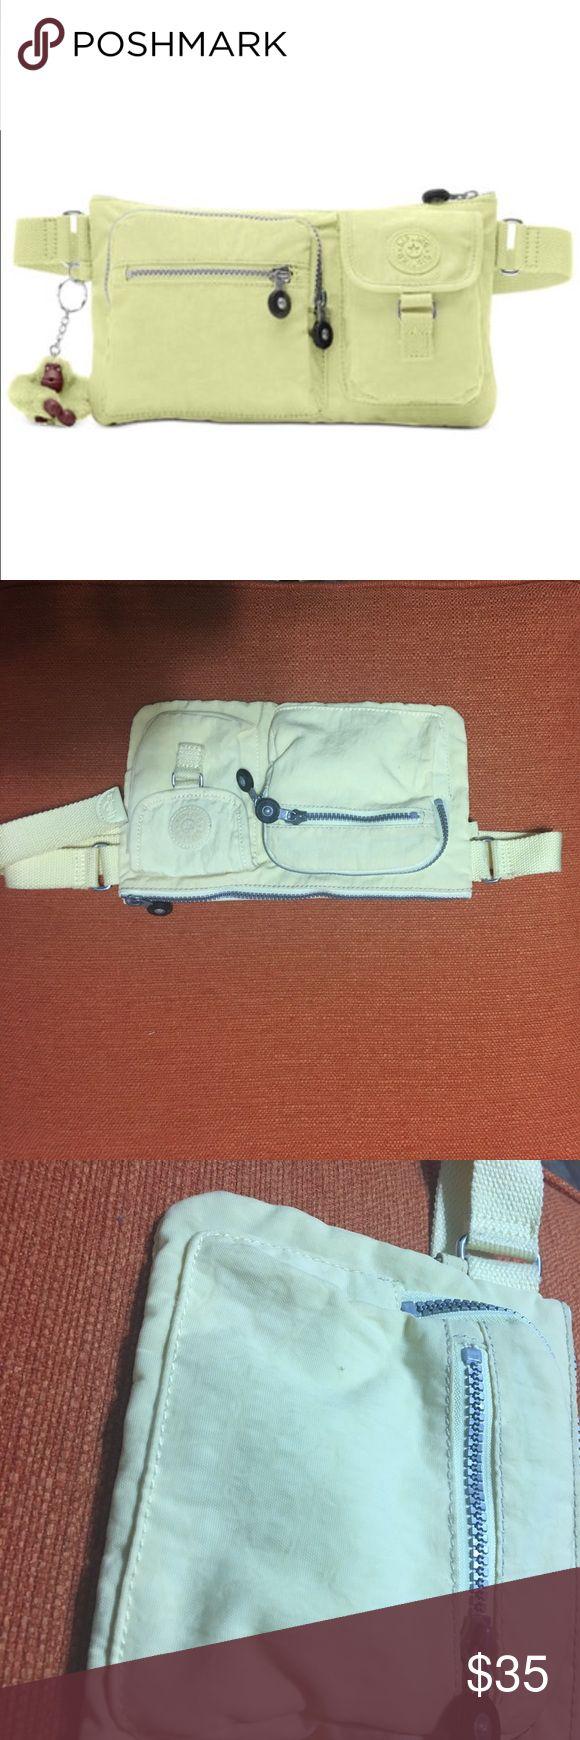 ⭐️ 30% OFF BUNDLES ⭐️ Kipling brand fanny pack bright yellow, no monkey key chain. Normal wear. Adjustable strap Kipling Bags Mini Bags